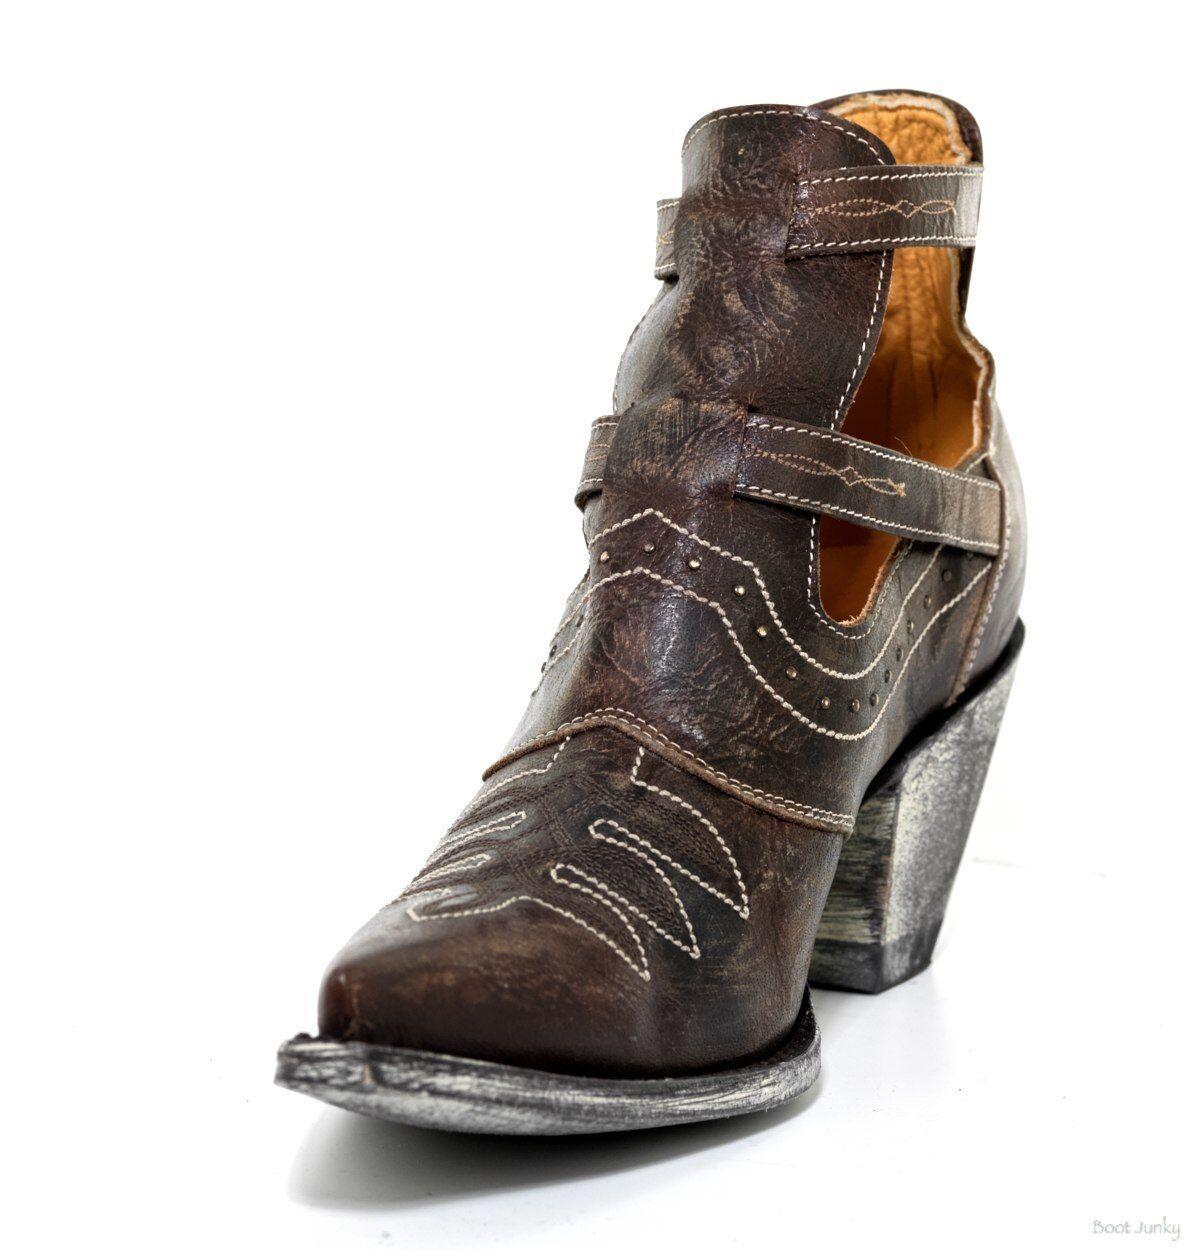 BL1892-2 OLD GRINGO JOY BRASS ANKLE chaussures bottes